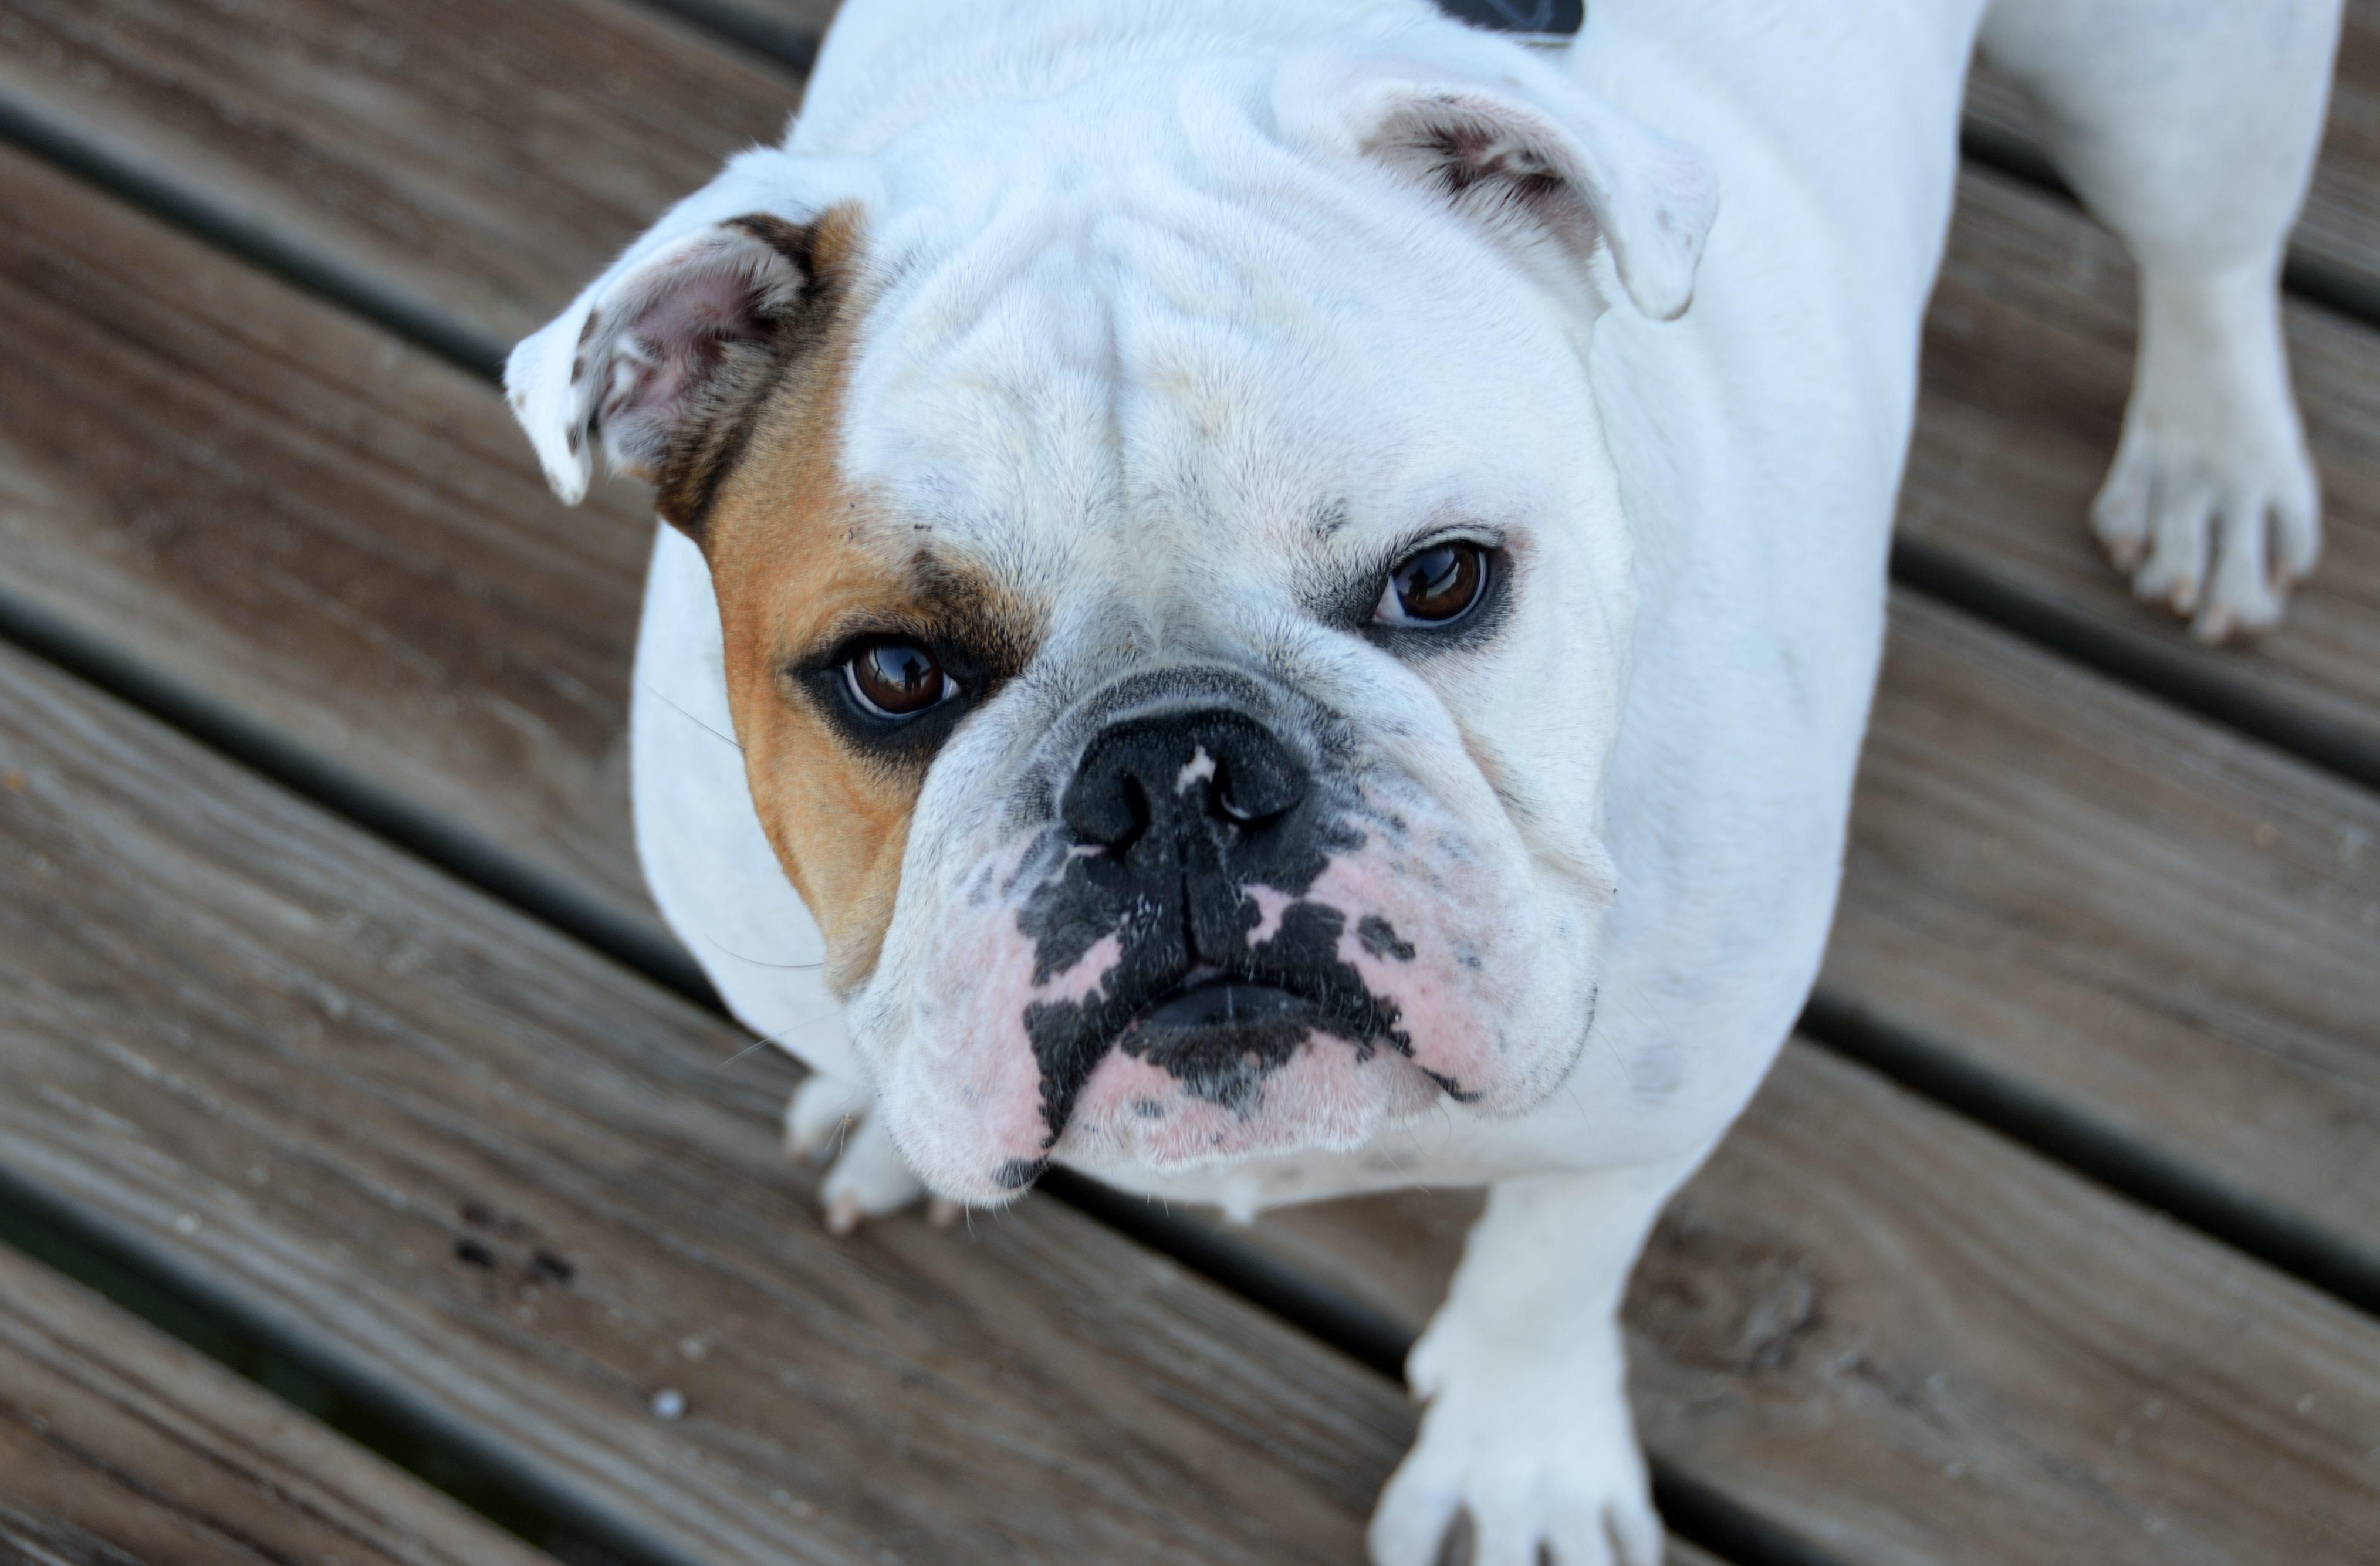 Free stock photos of bulldog Pexels